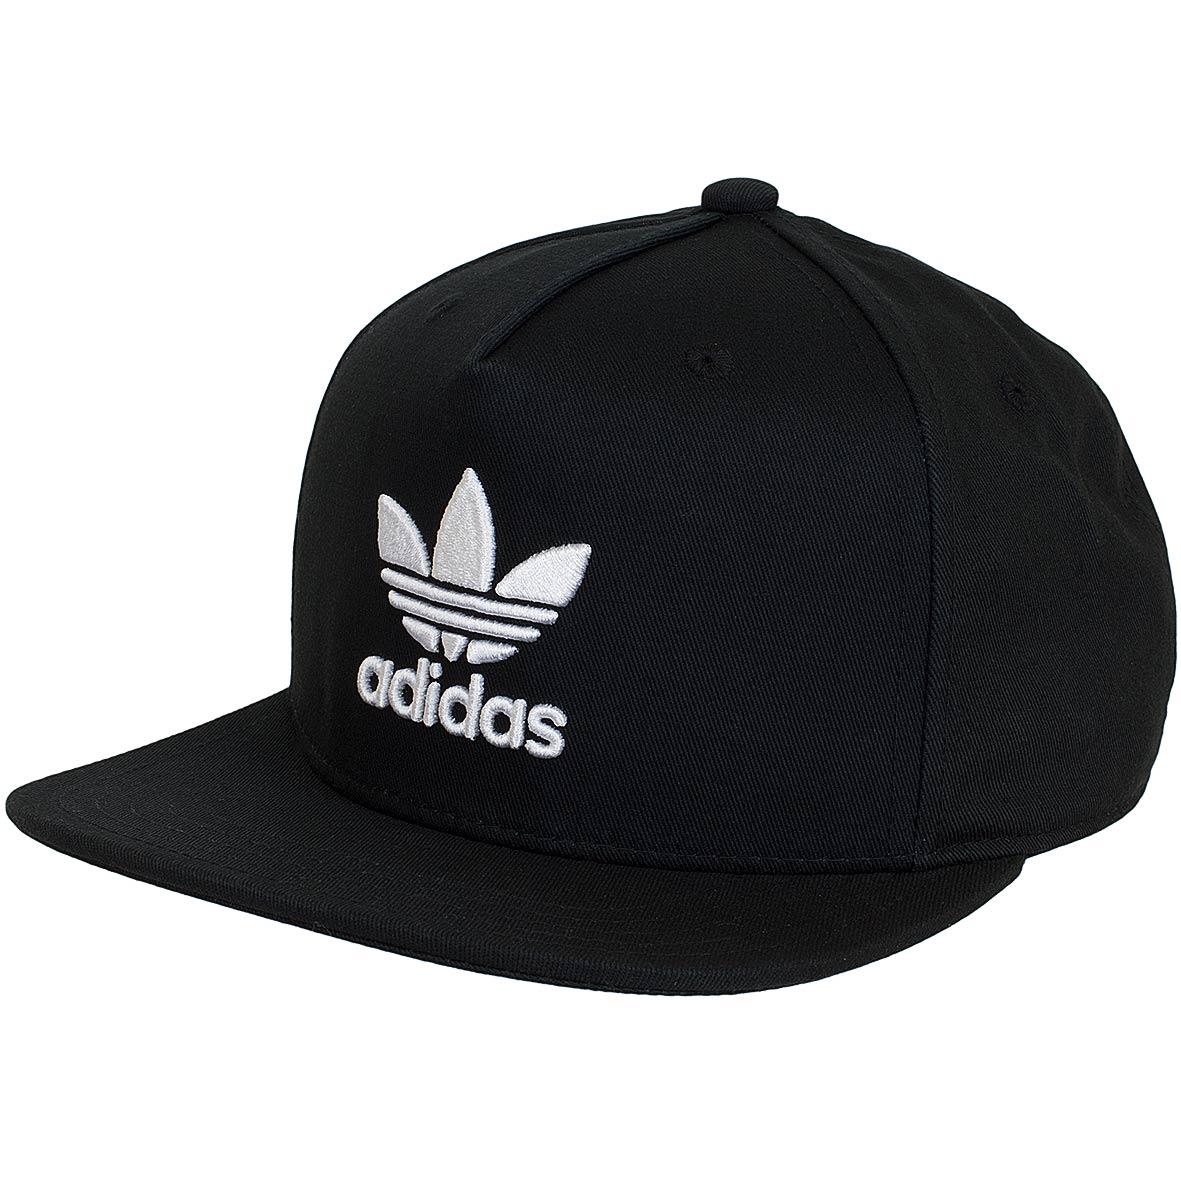 adidas originals snapback cap ac trefoil flat schwarz wei. Black Bedroom Furniture Sets. Home Design Ideas